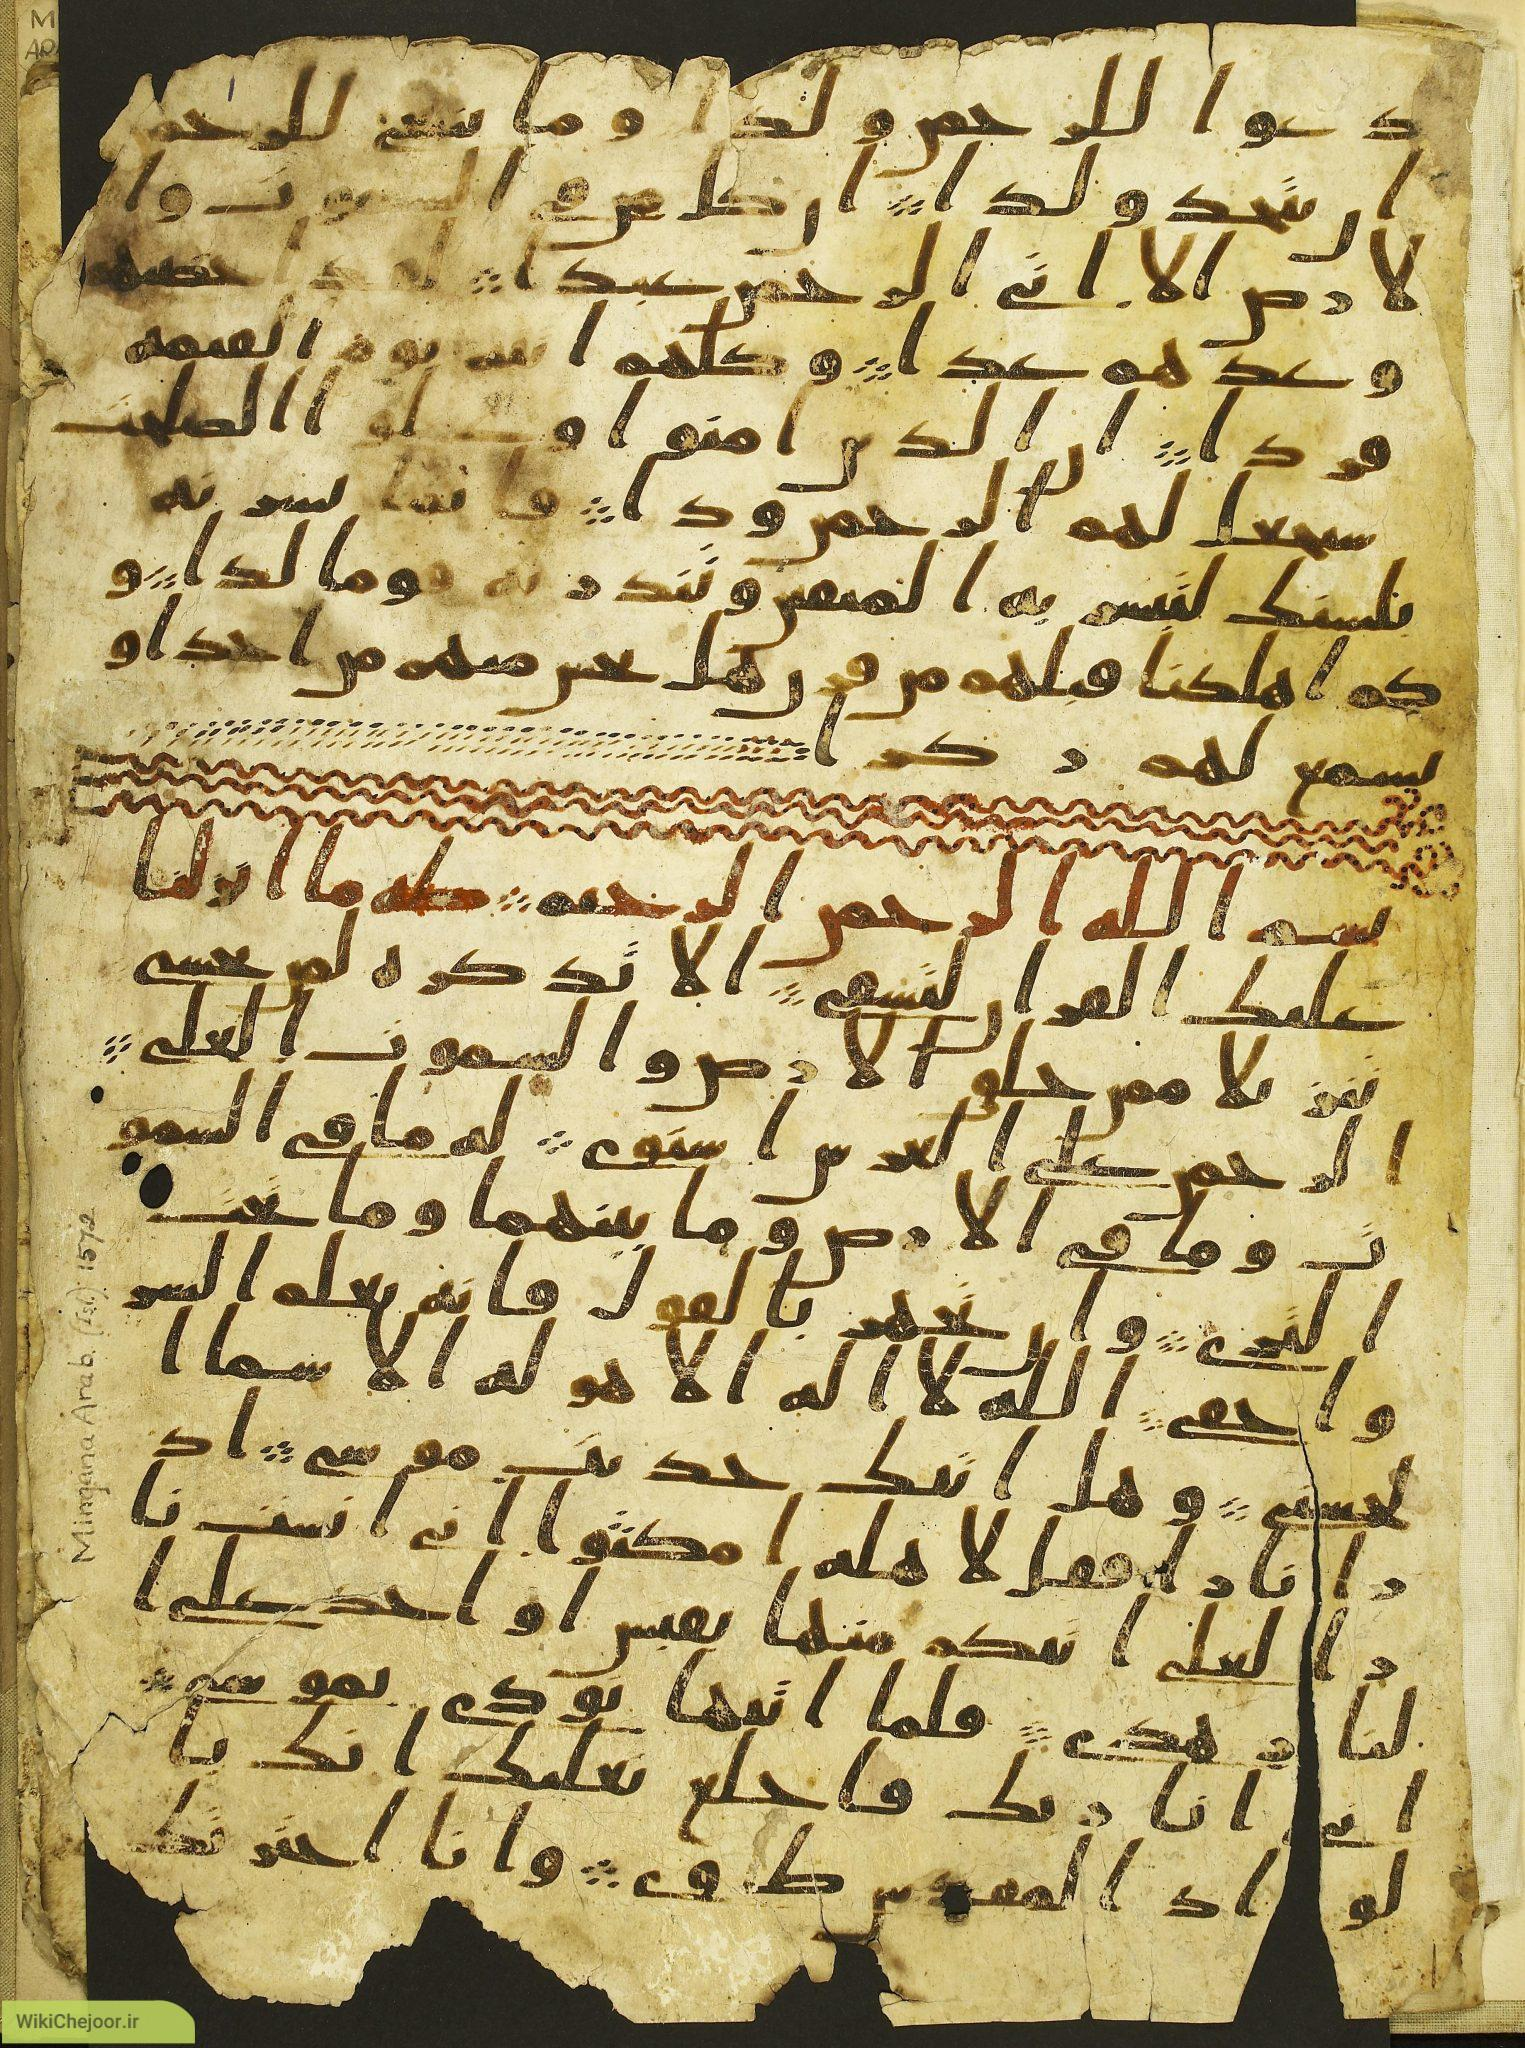 چگونه با تاریخ اسلام آشناشویم ؟(بخش ۲)